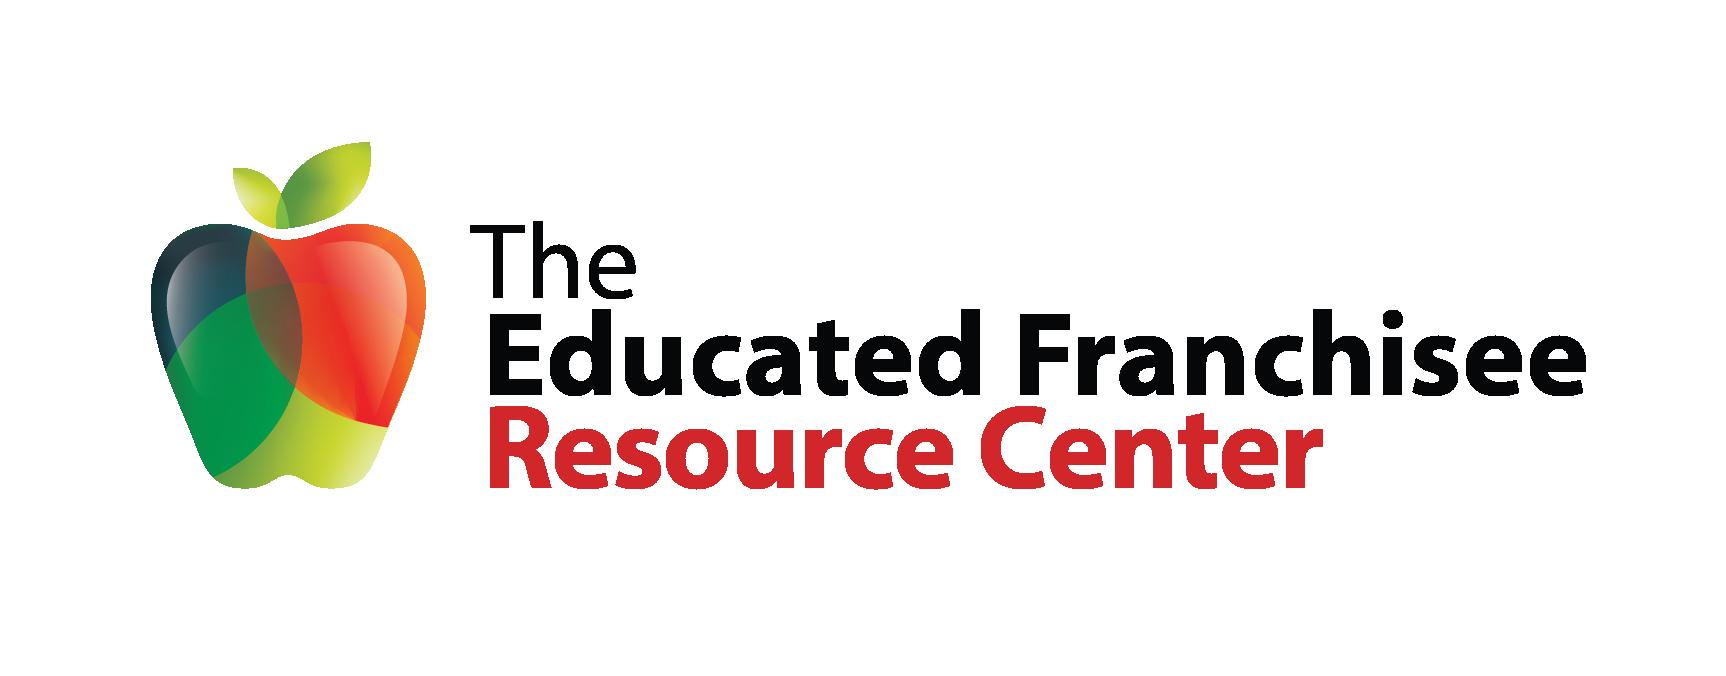 https://www.thefddstore.com/wp-content/uploads/2017/08/EF_Resource.png